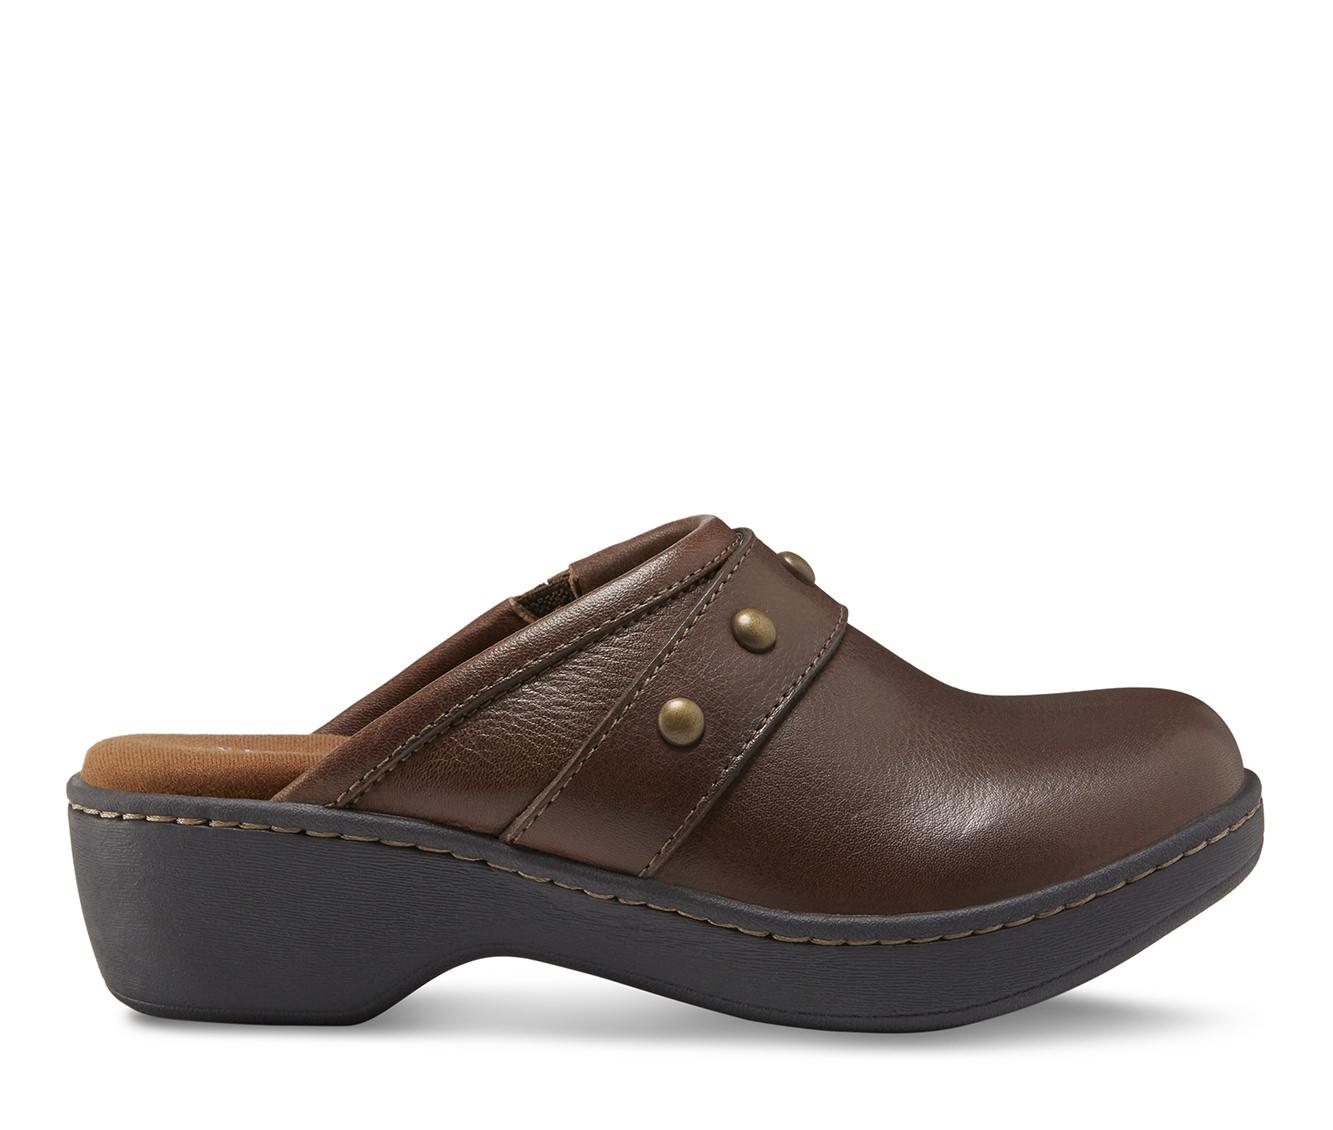 Eastland Gabriella Women's Shoe (Brown Leather)